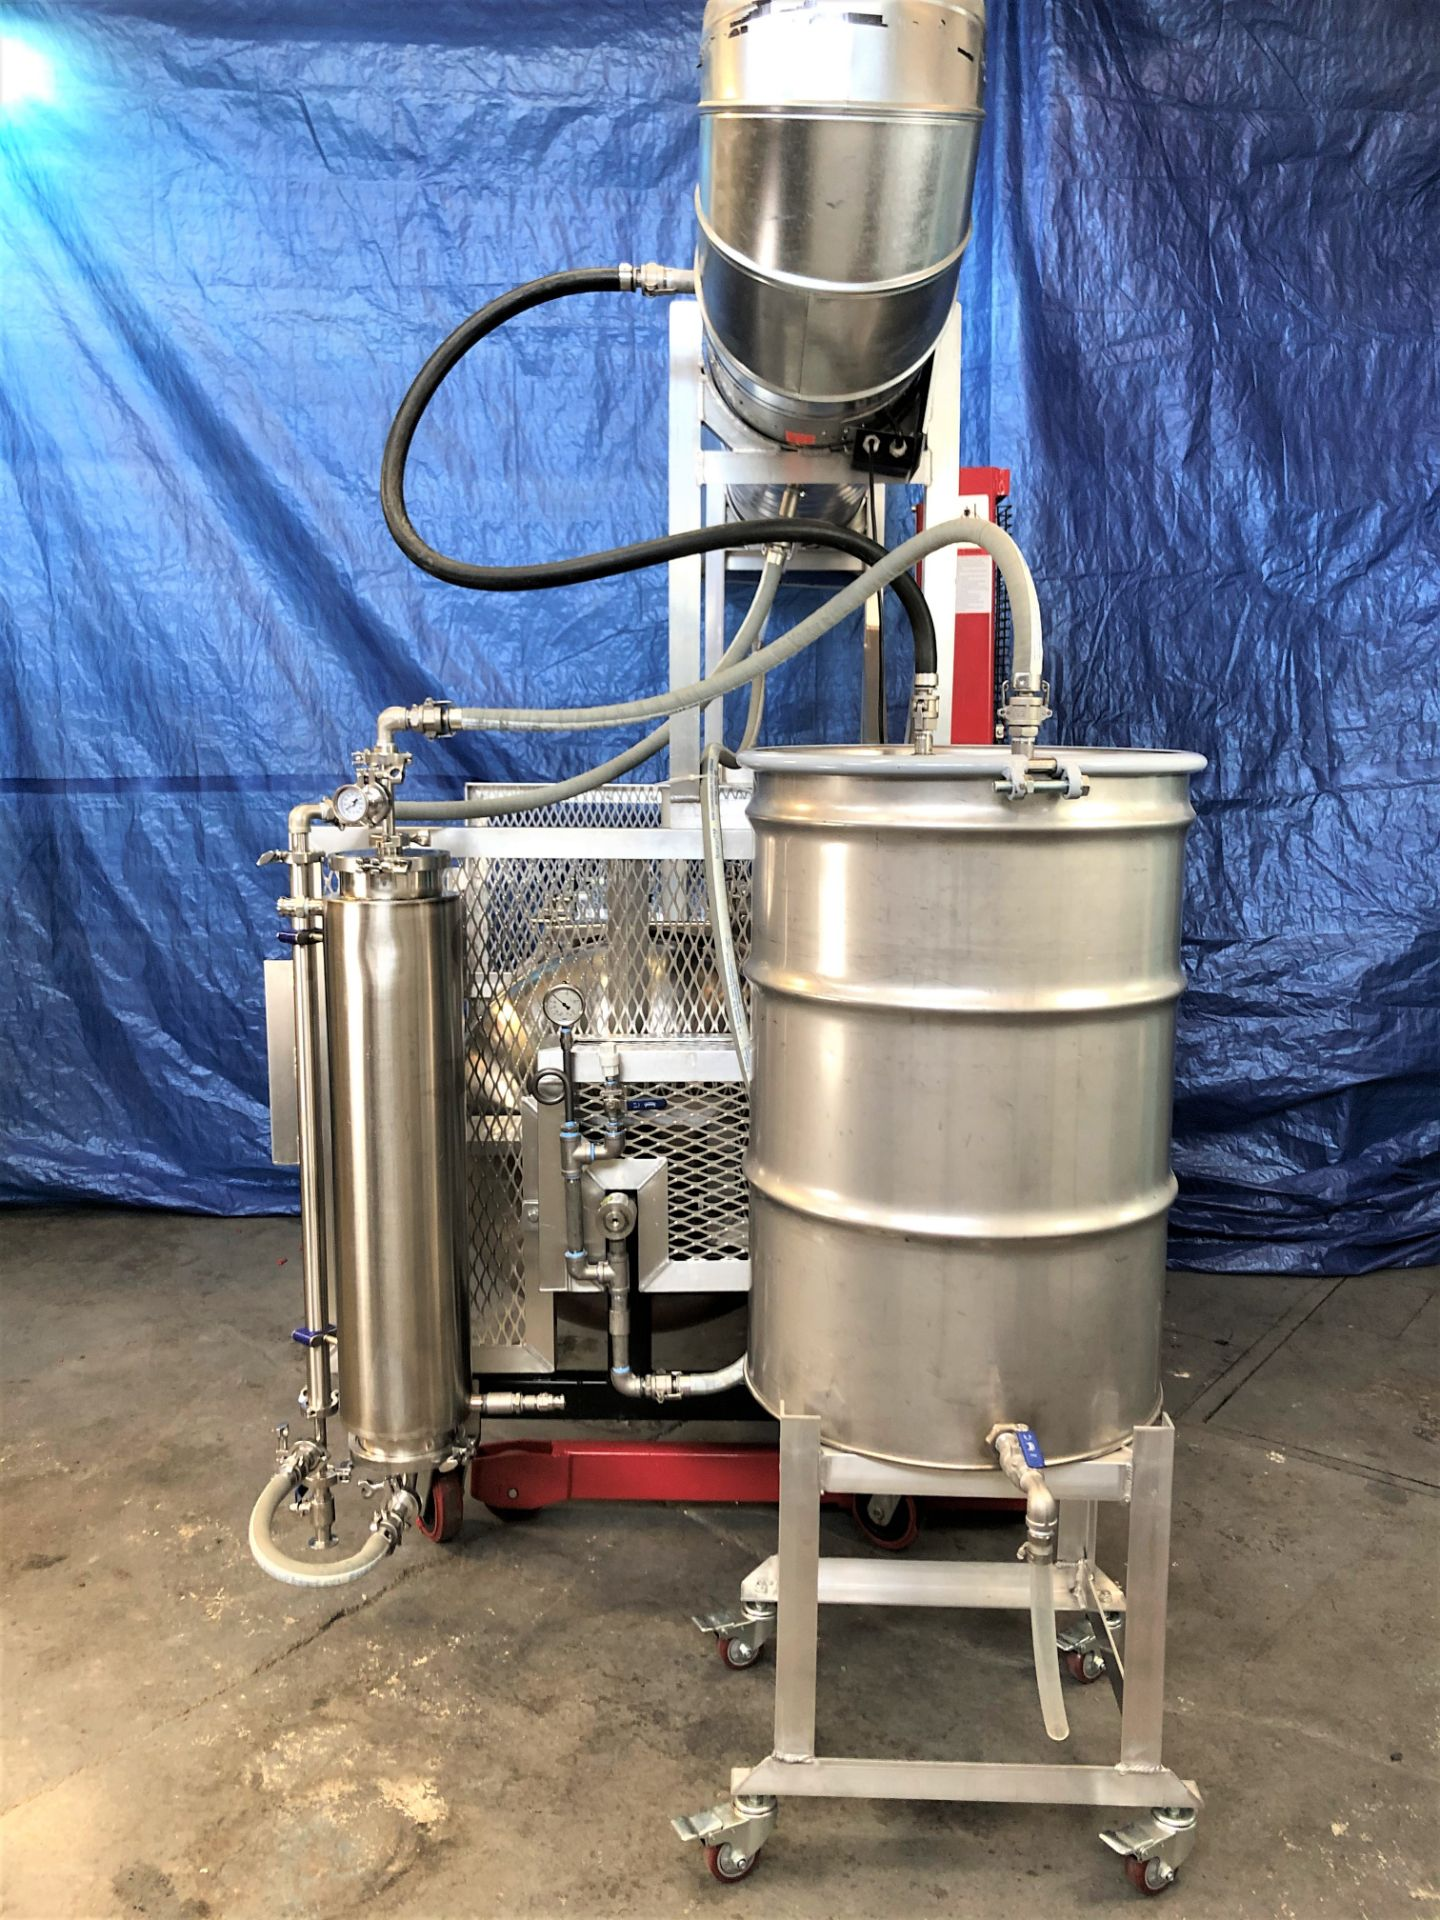 Used- Tumble Dryer w/ Molecular Sieve Column & 55 Gallon Collection Drum. Volume: 18 CuFt. - Image 4 of 11